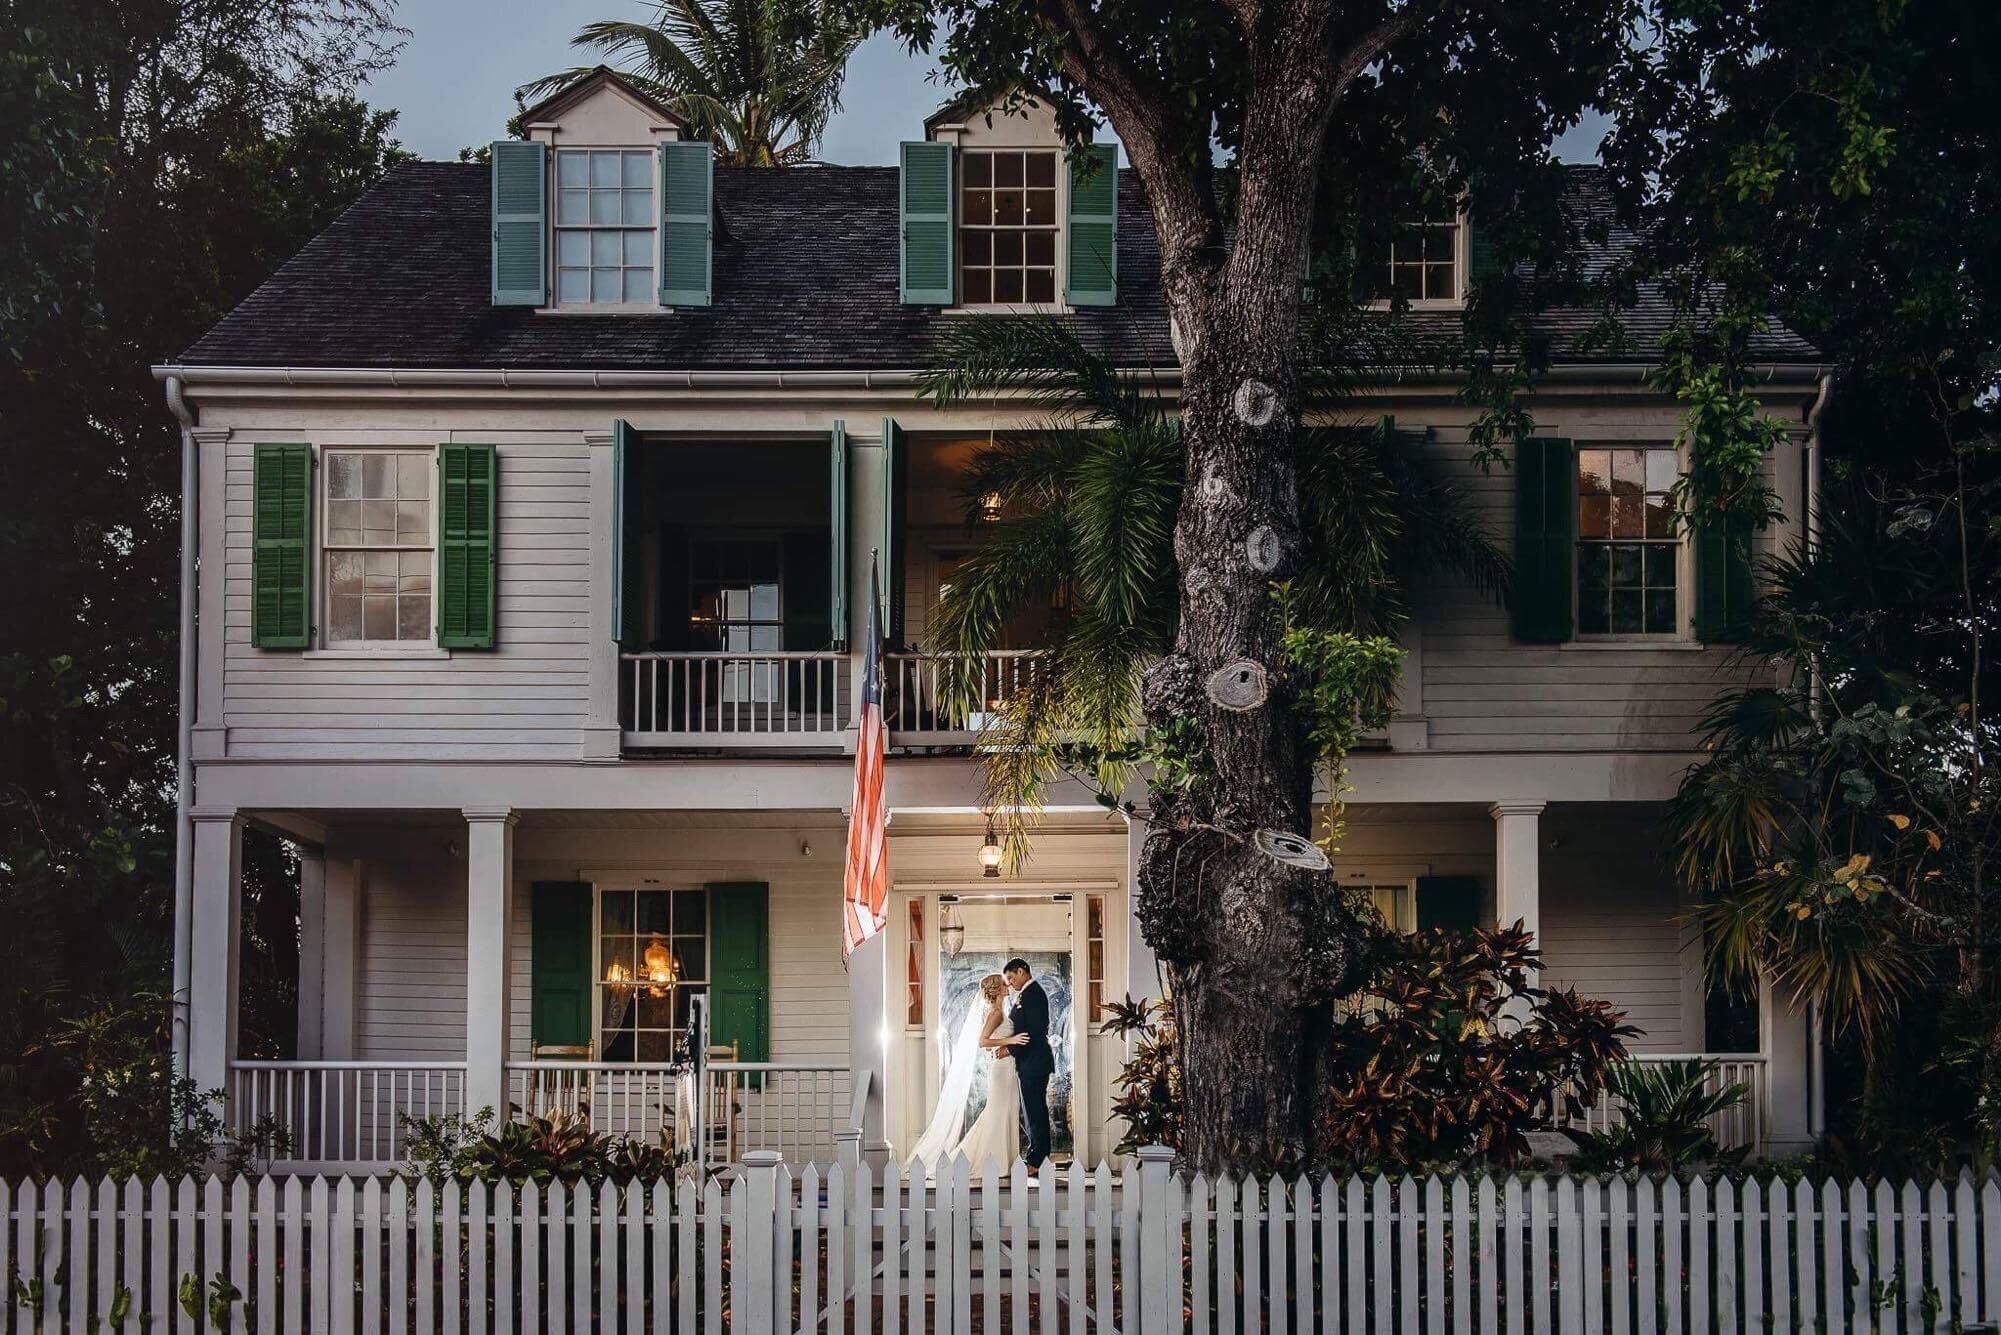 STACY + FABIAN | AUDUBON HOUSE WEDDING